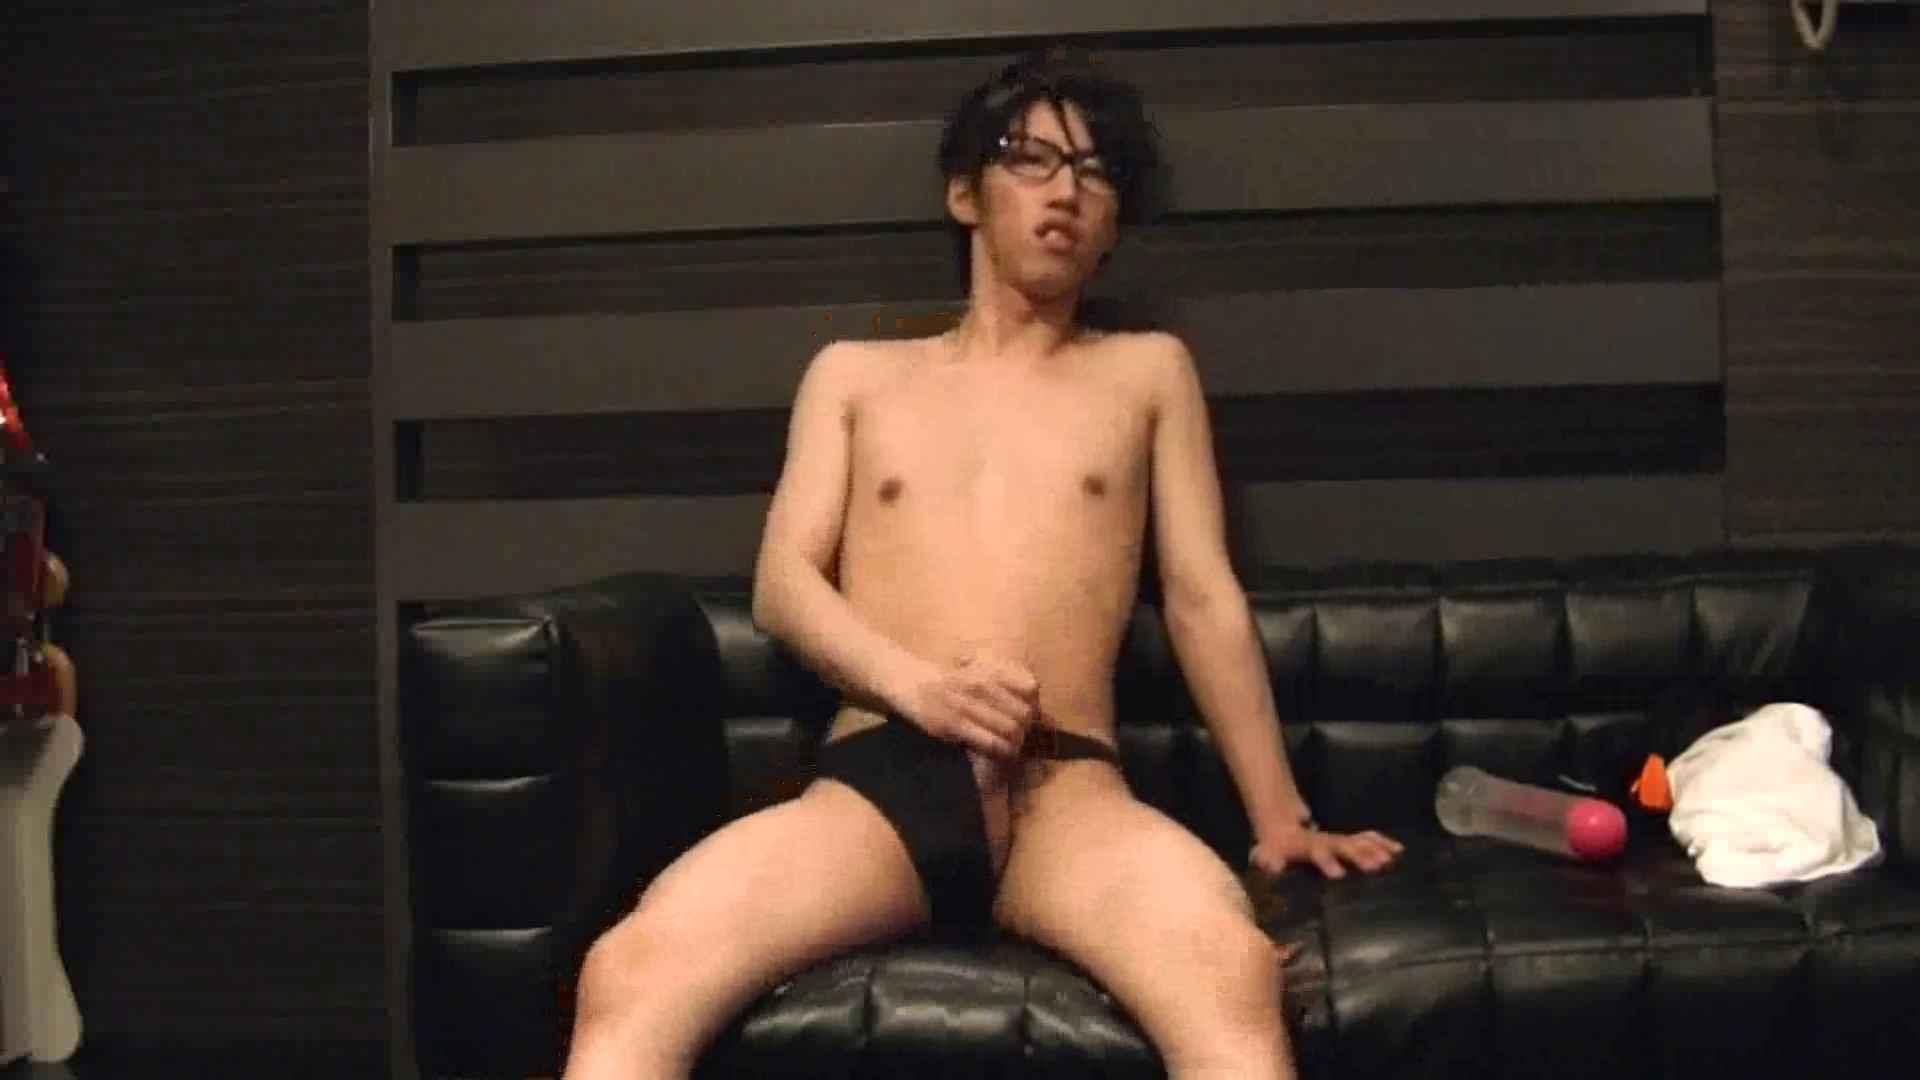 ONA見せカーニバル!! Vol3 男 ゲイ無料無修正画像 89枚 61